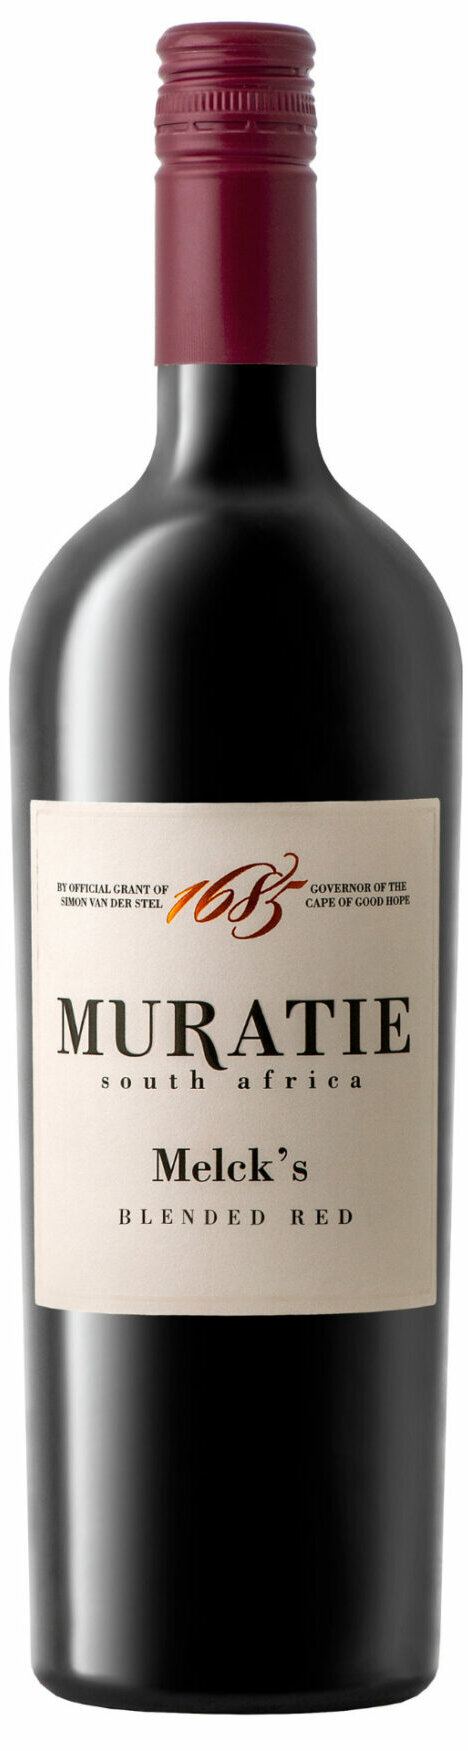 Muratie Melck's Blend Red